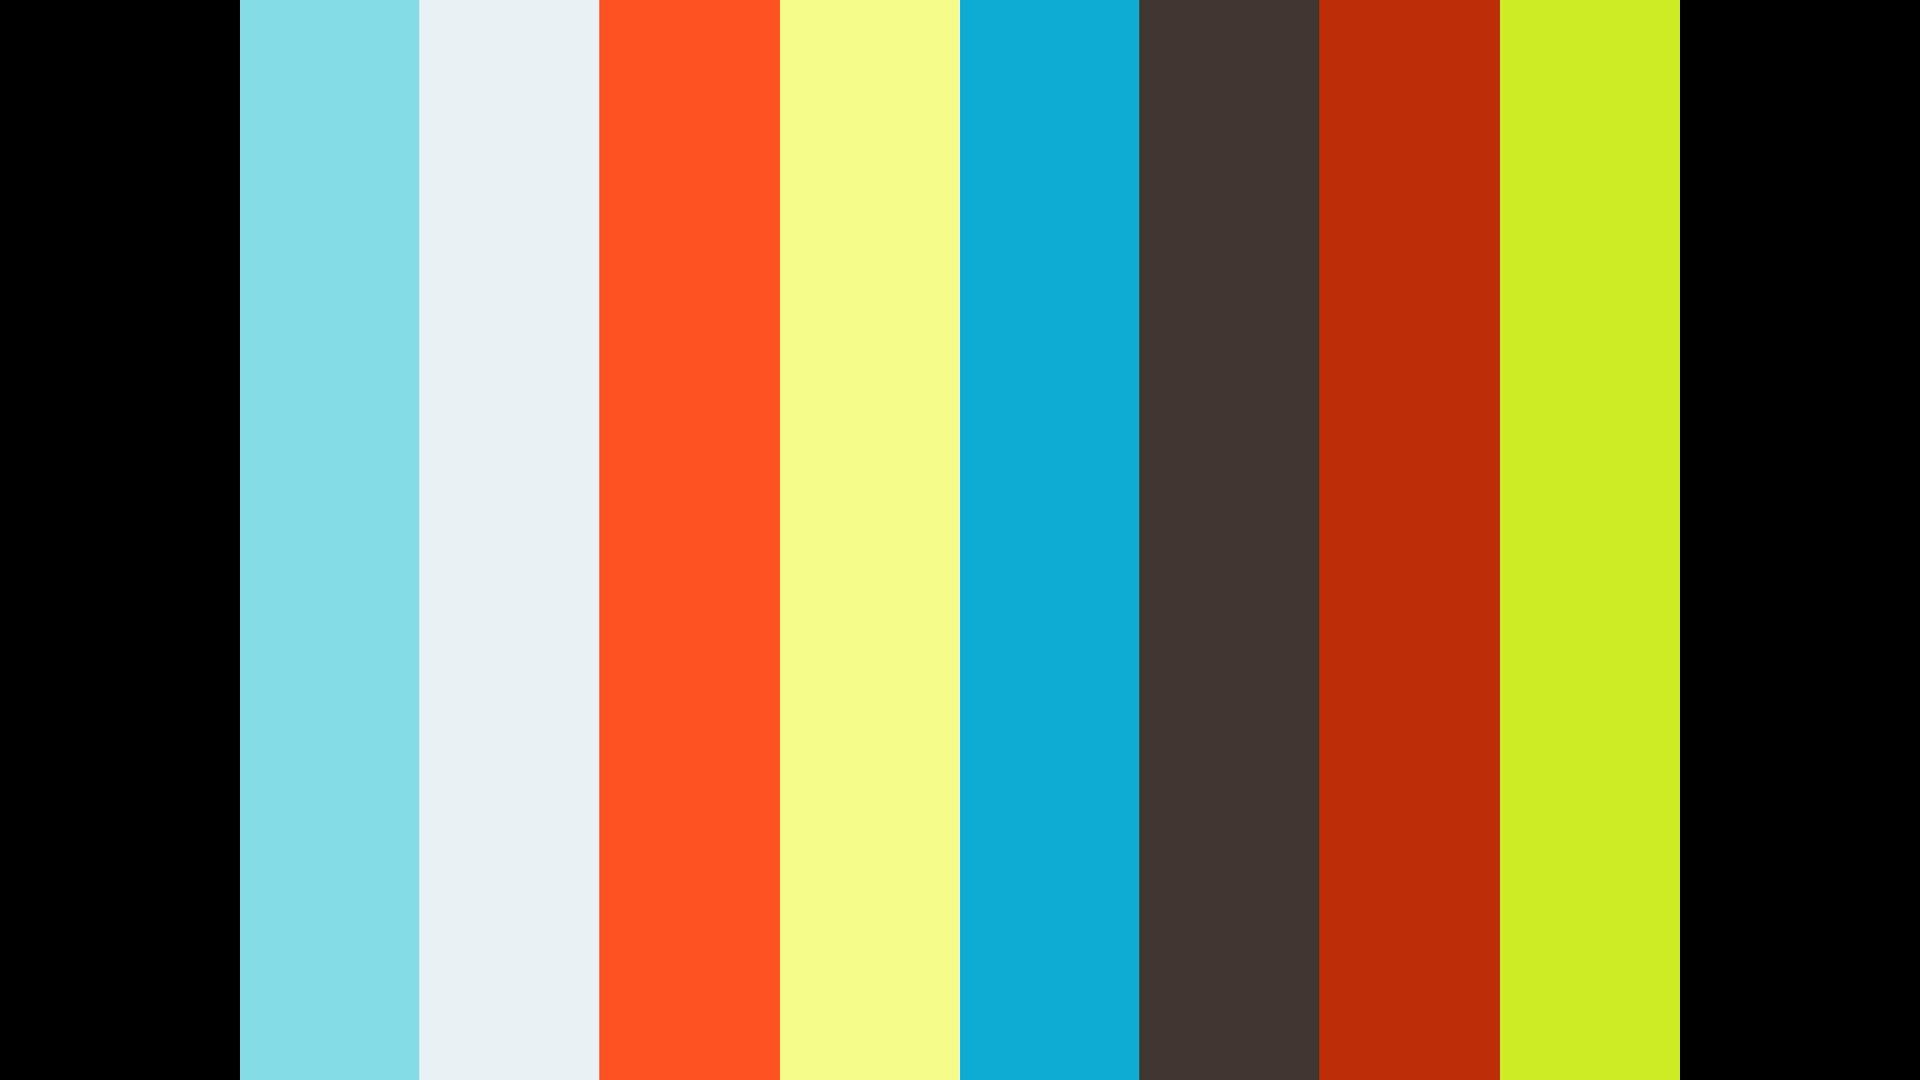 Liverdonk Teaser - Itch | Foxmountain